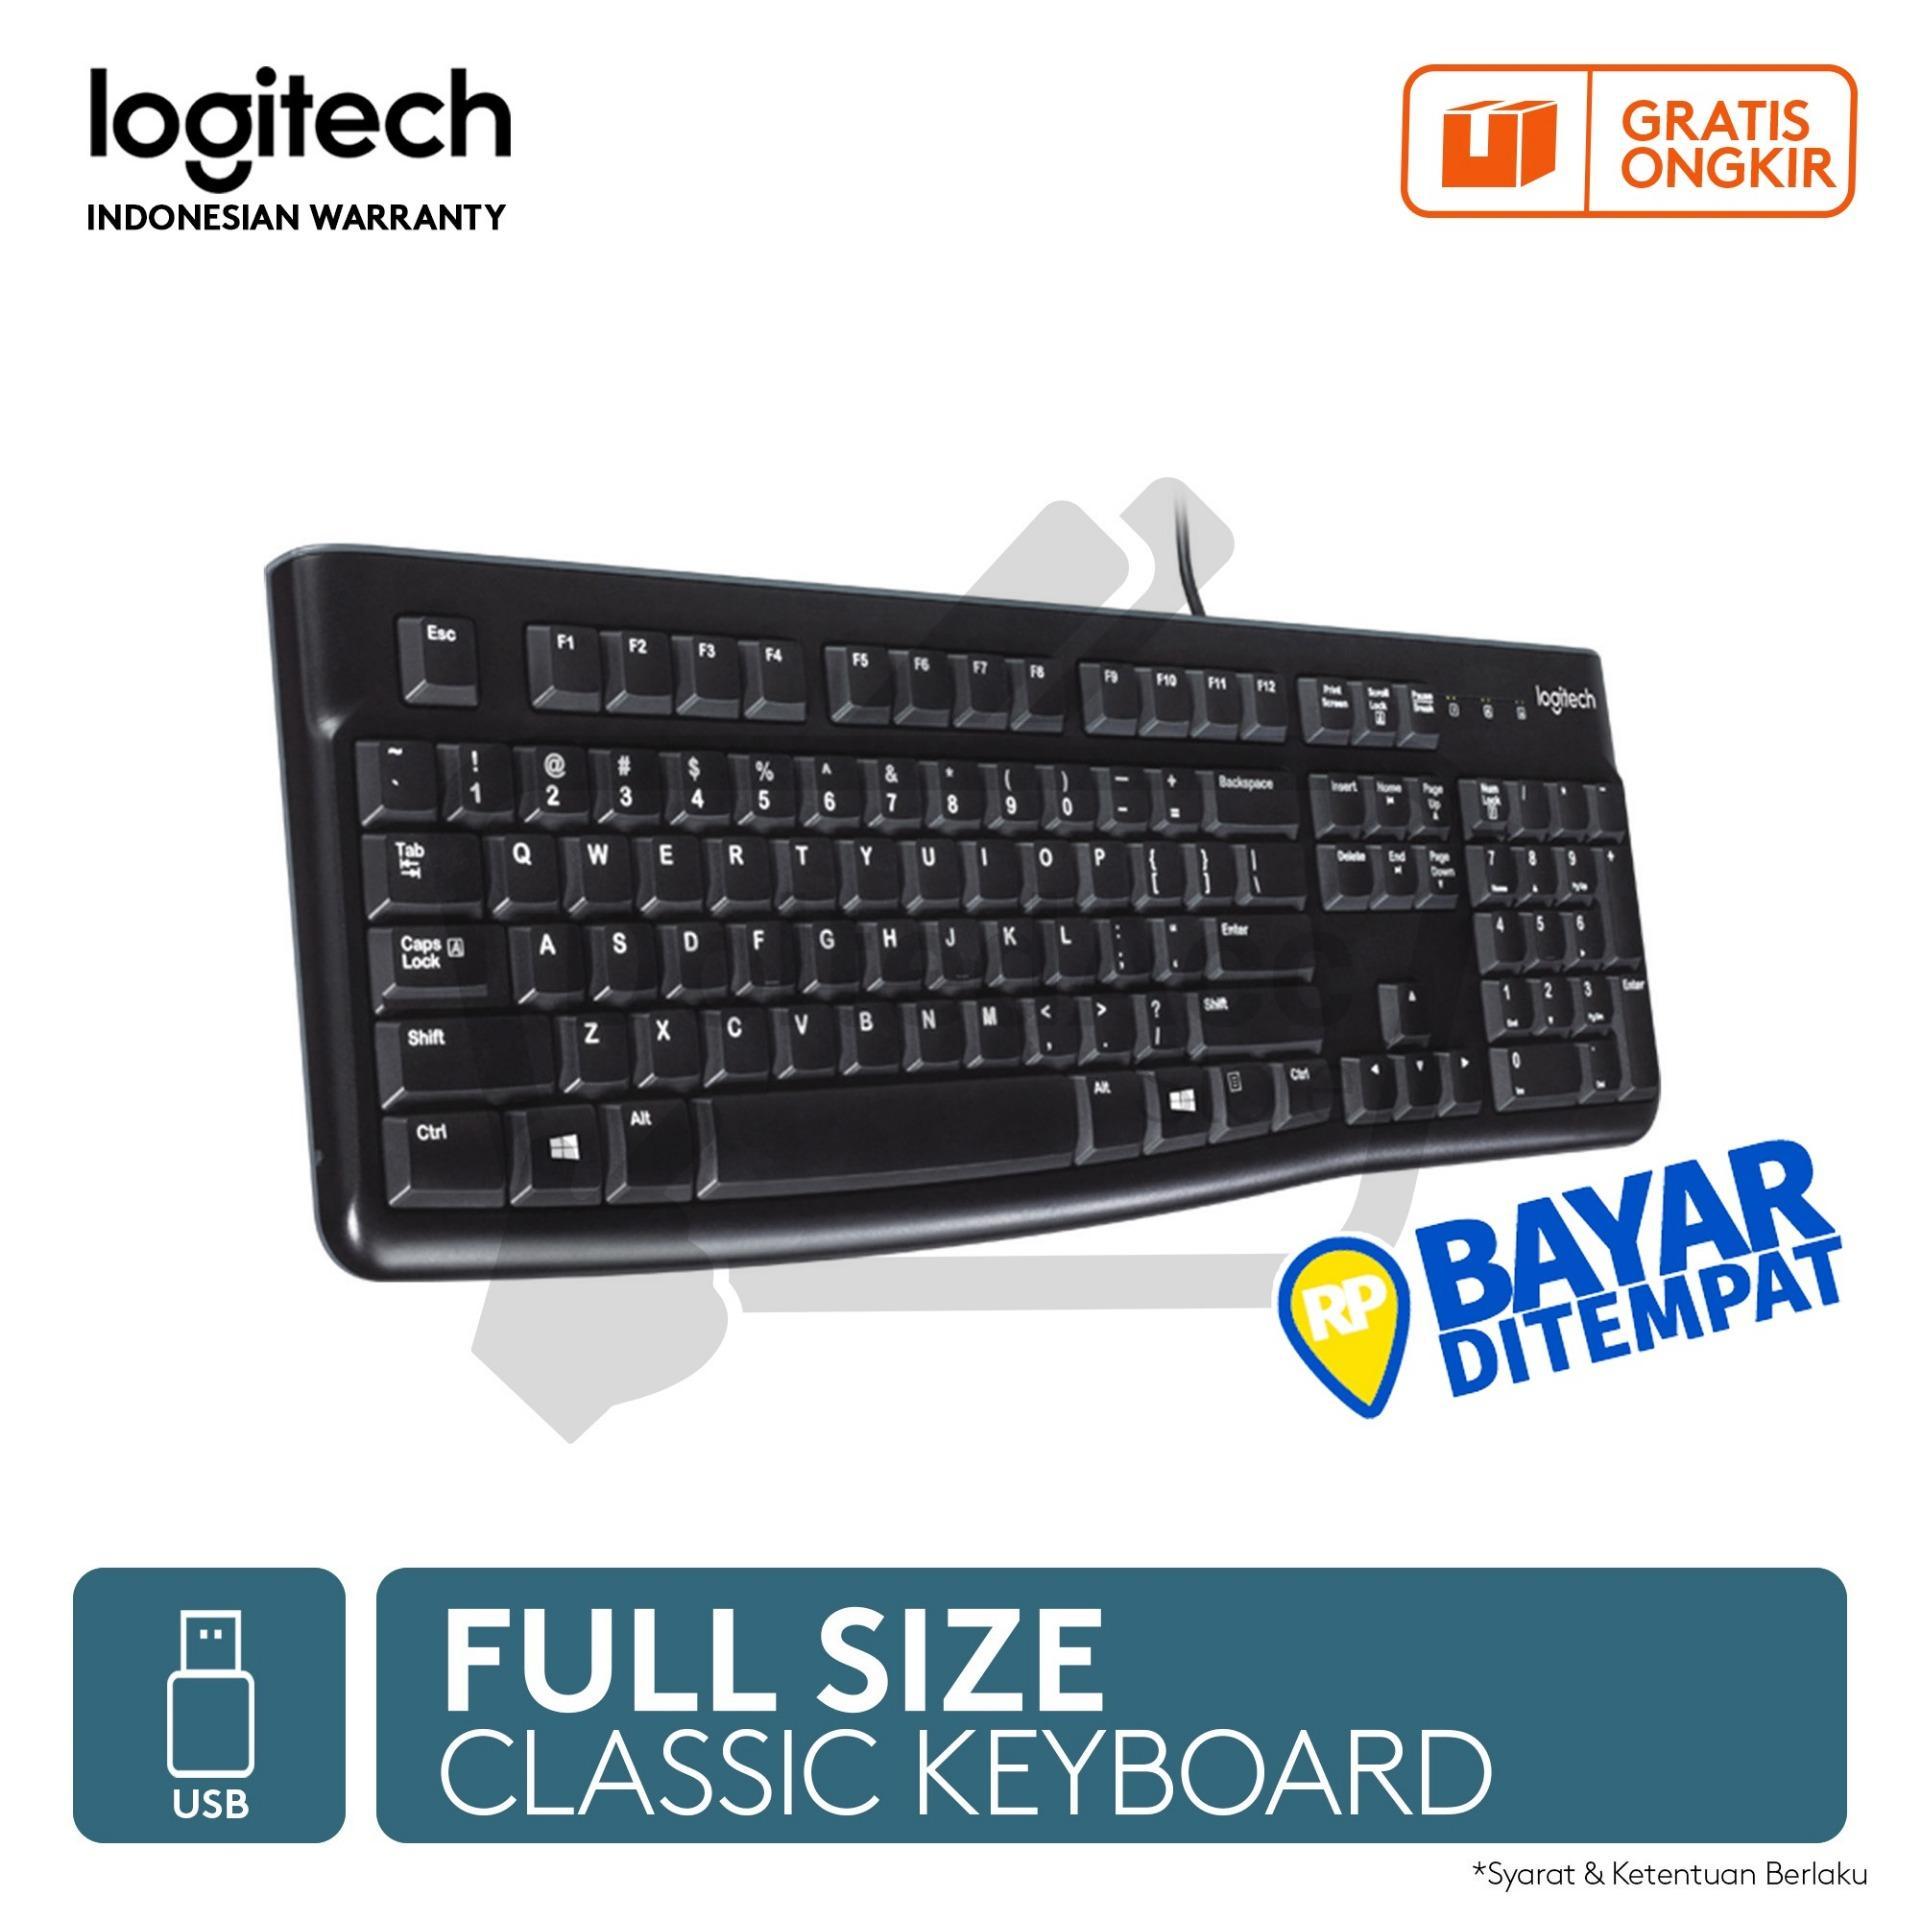 Detail Gambar Logitech Keyboard K120 - USB - Hitam Terbaru